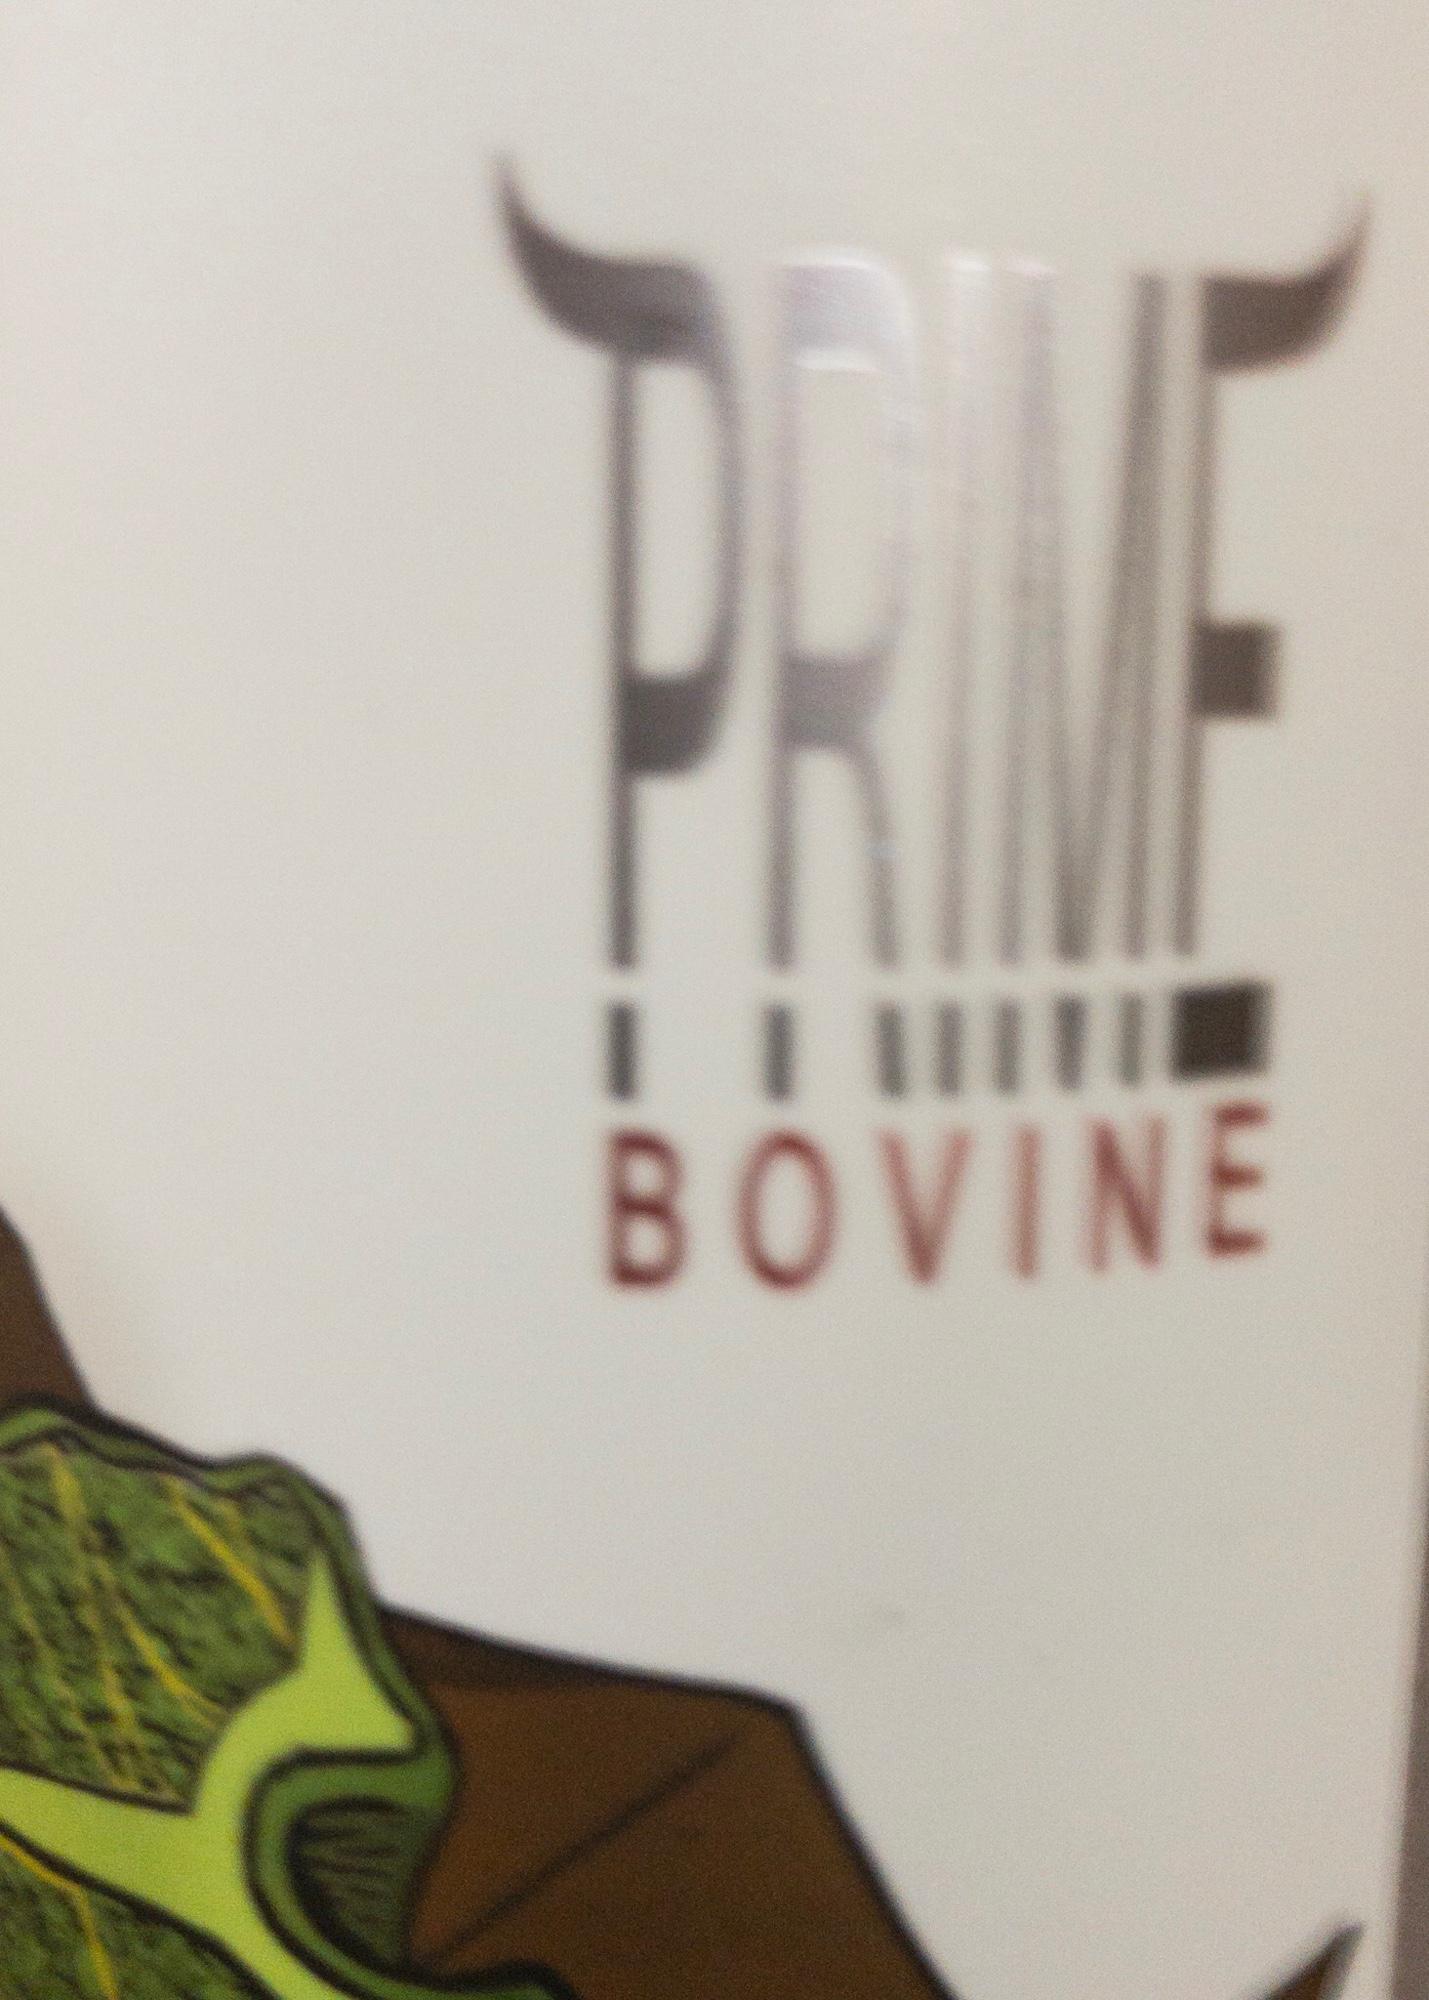 Bolero Snort Brewery's Prime Bovine